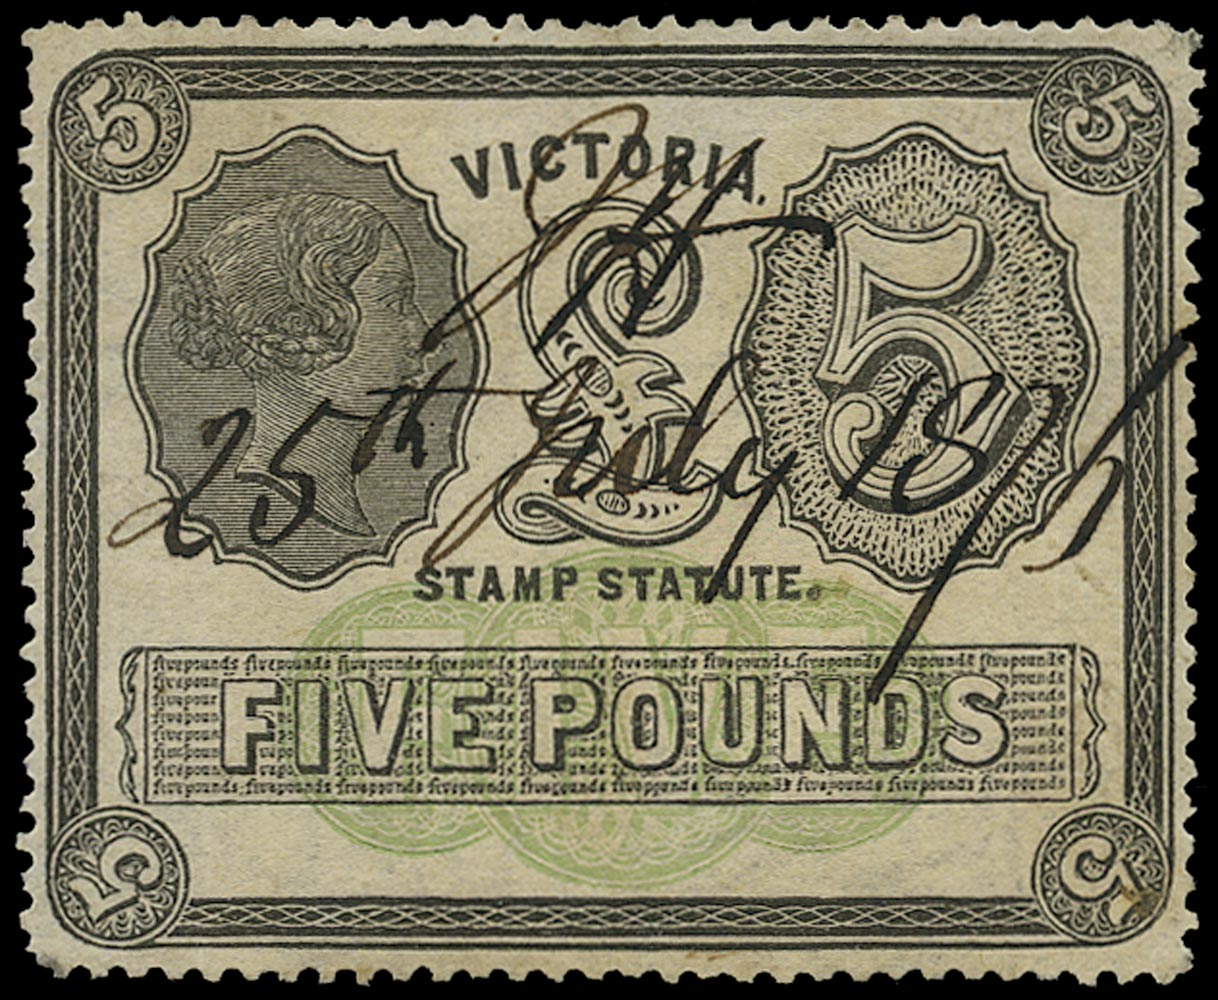 VICTORIA (AUS) 1884  SG233var Revenue Stamp Statute £5 black and yellow-green